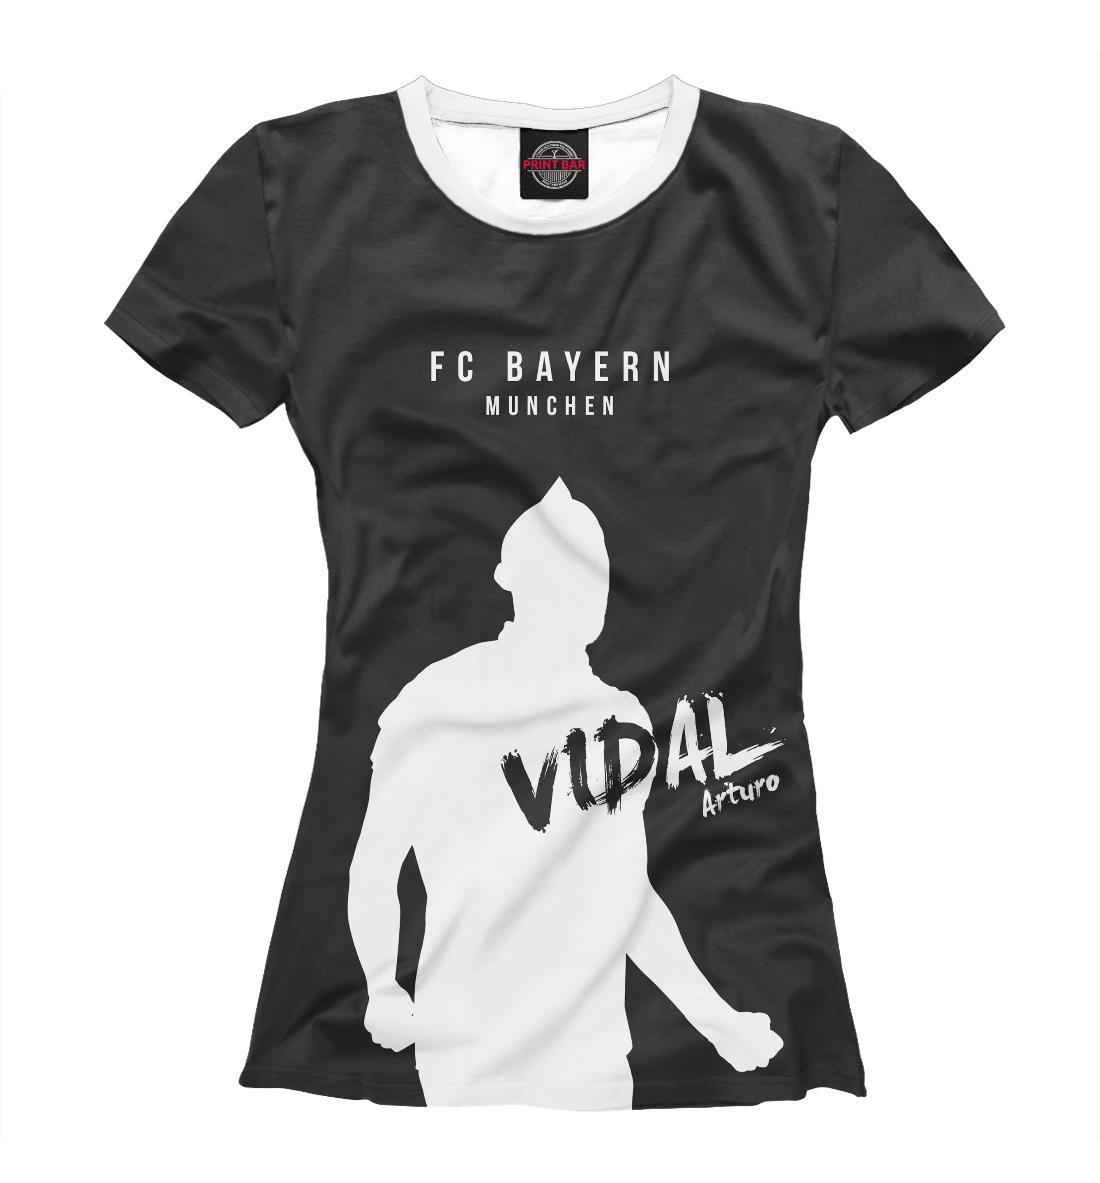 Купить Vidal, Printbar, Футболки, BAY-602526-fut-1